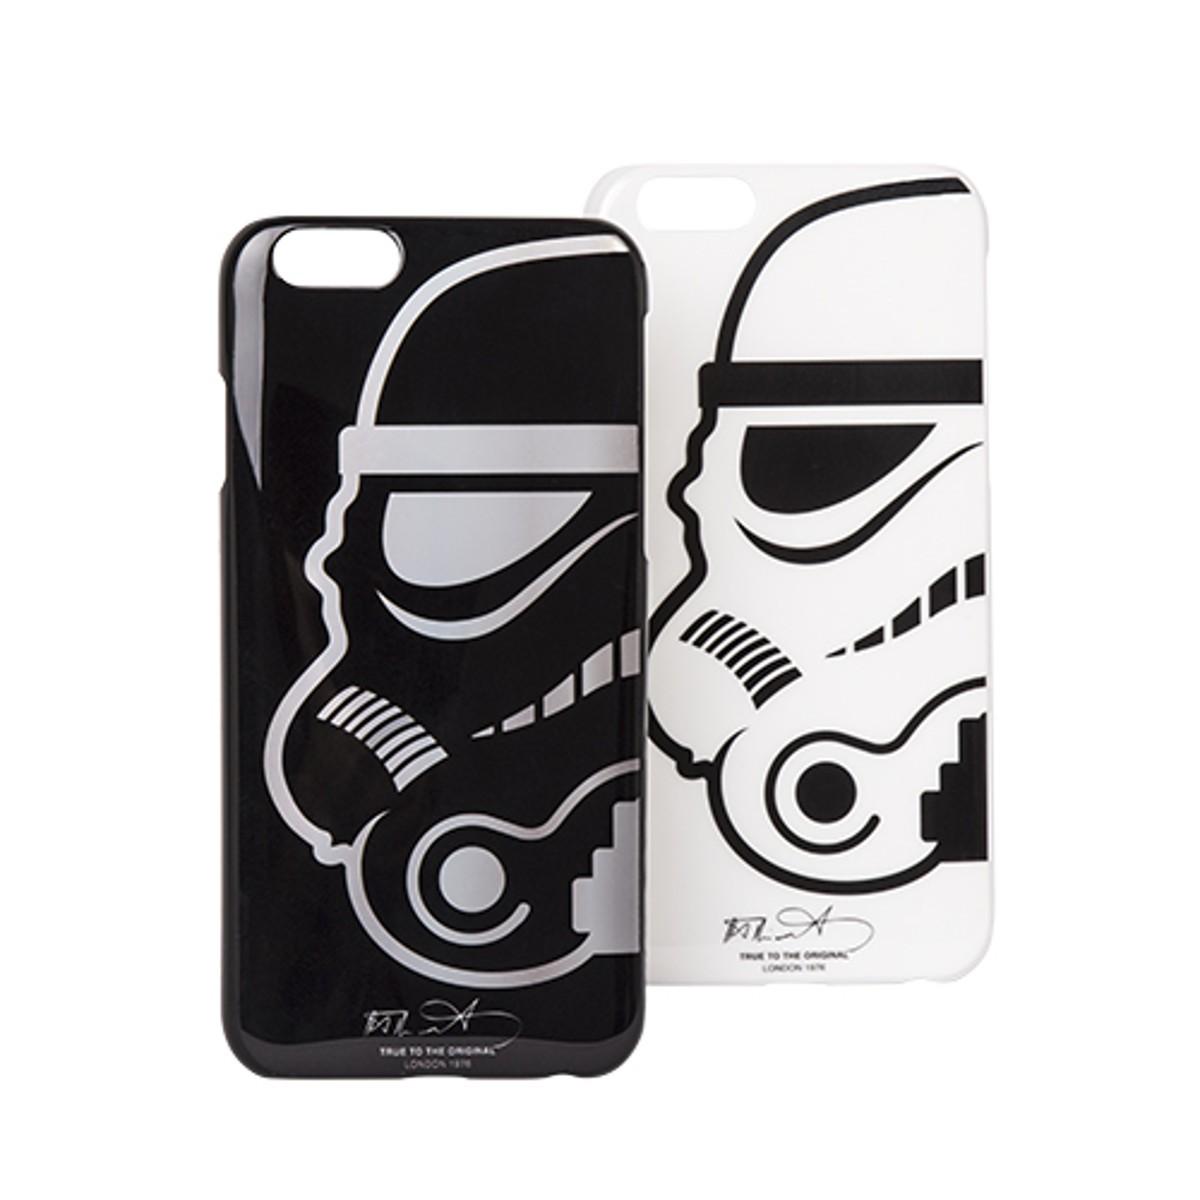 Offizielles Stormtrooper-Case für iPhone 6 / 6S